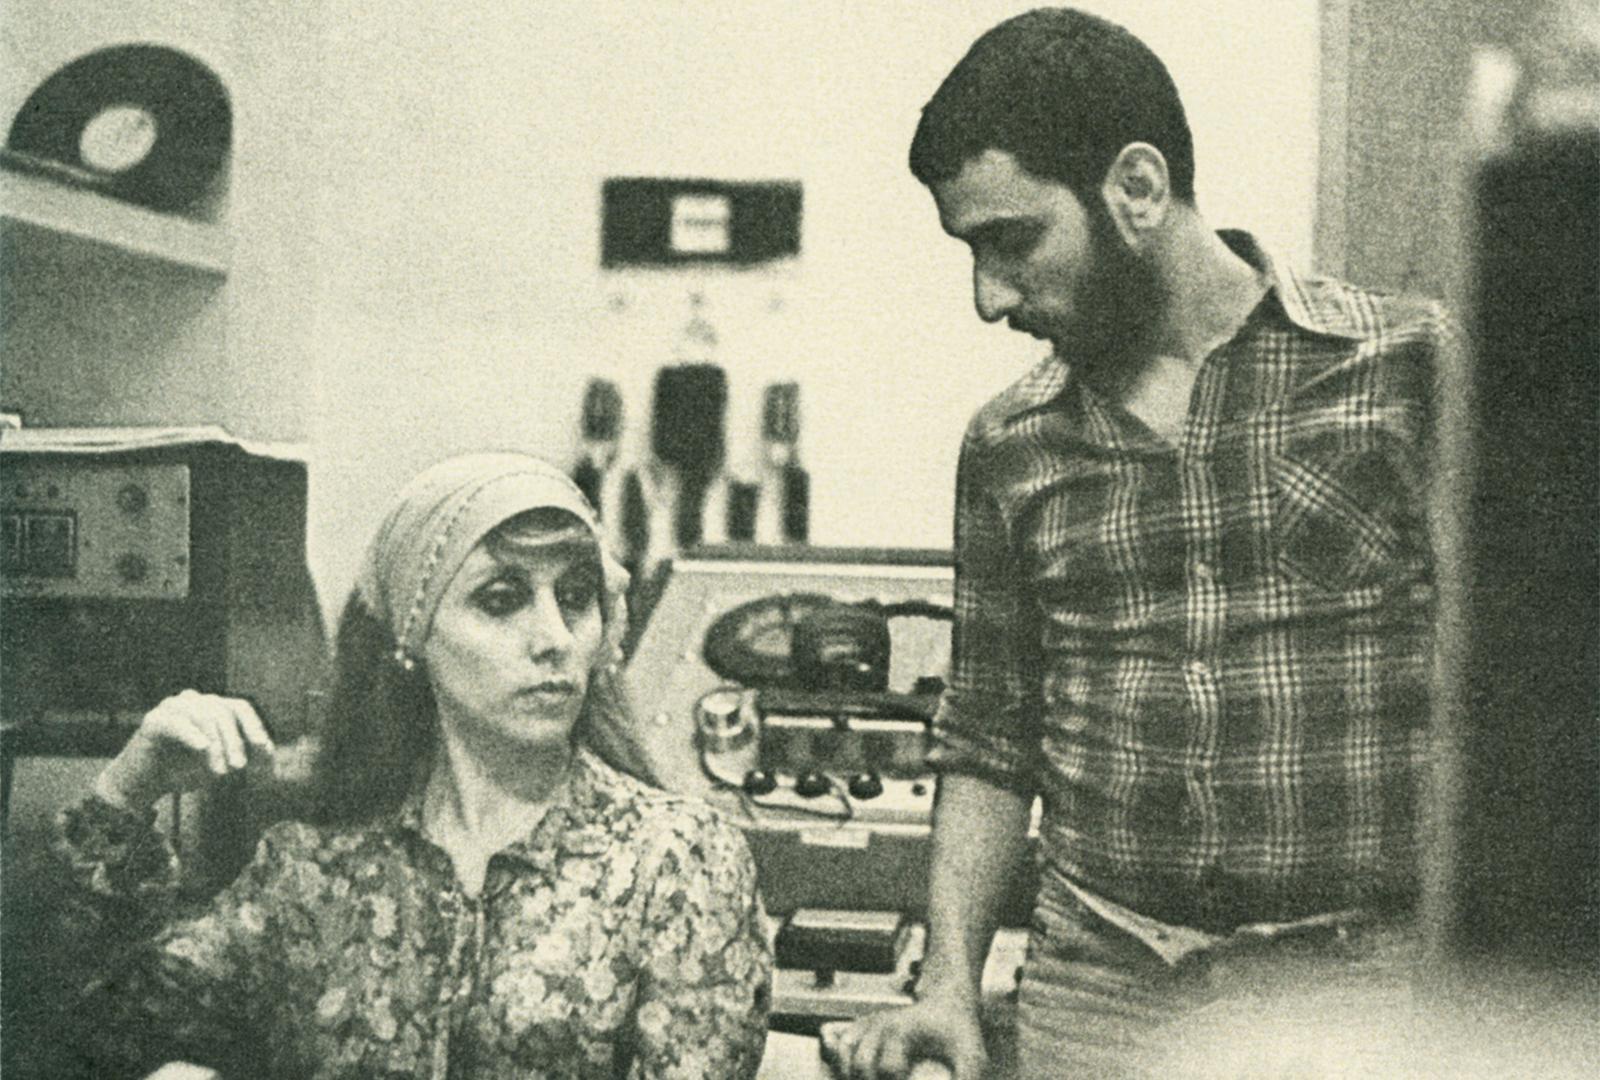 Lebanese singer Fairuz' 1987 LP Maarifti Feek reissued for the first time